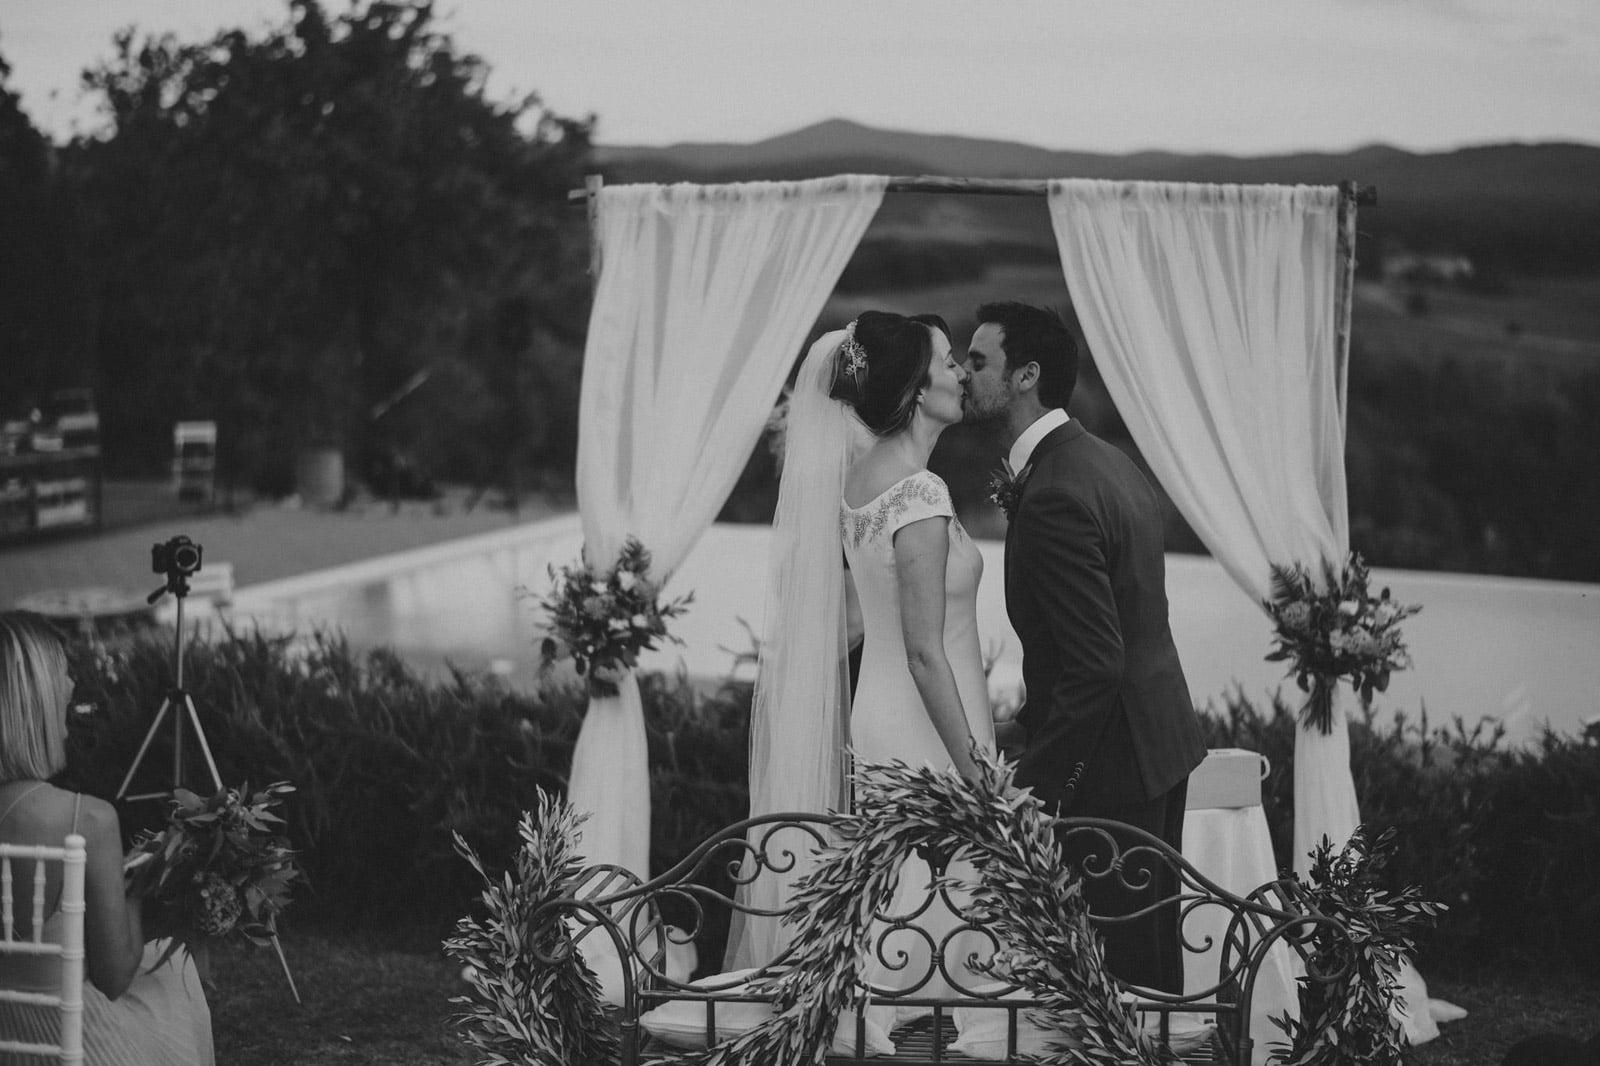 064-wedding-tuscany-san-galgano-federico-pannacci-photographer